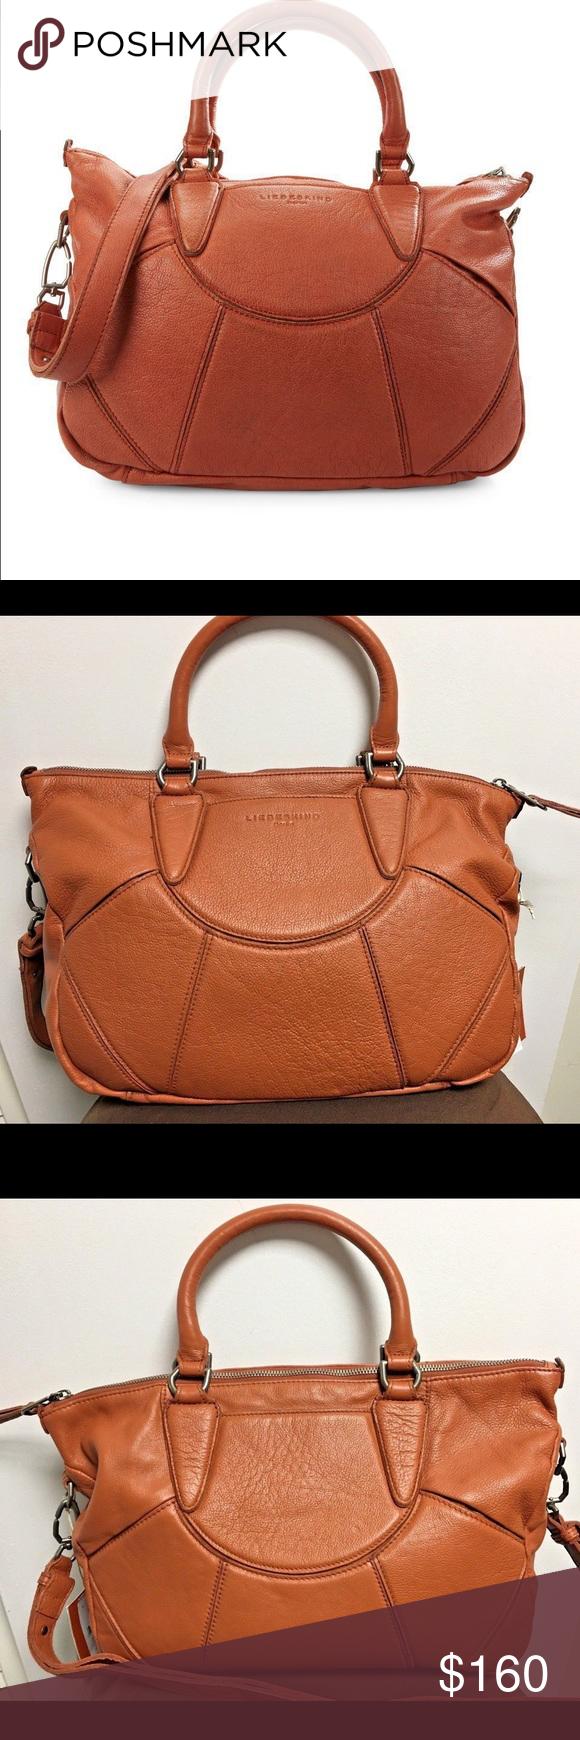 New Liebeskind Berlin Esther Vintage Satchel Bag 100 Authentic